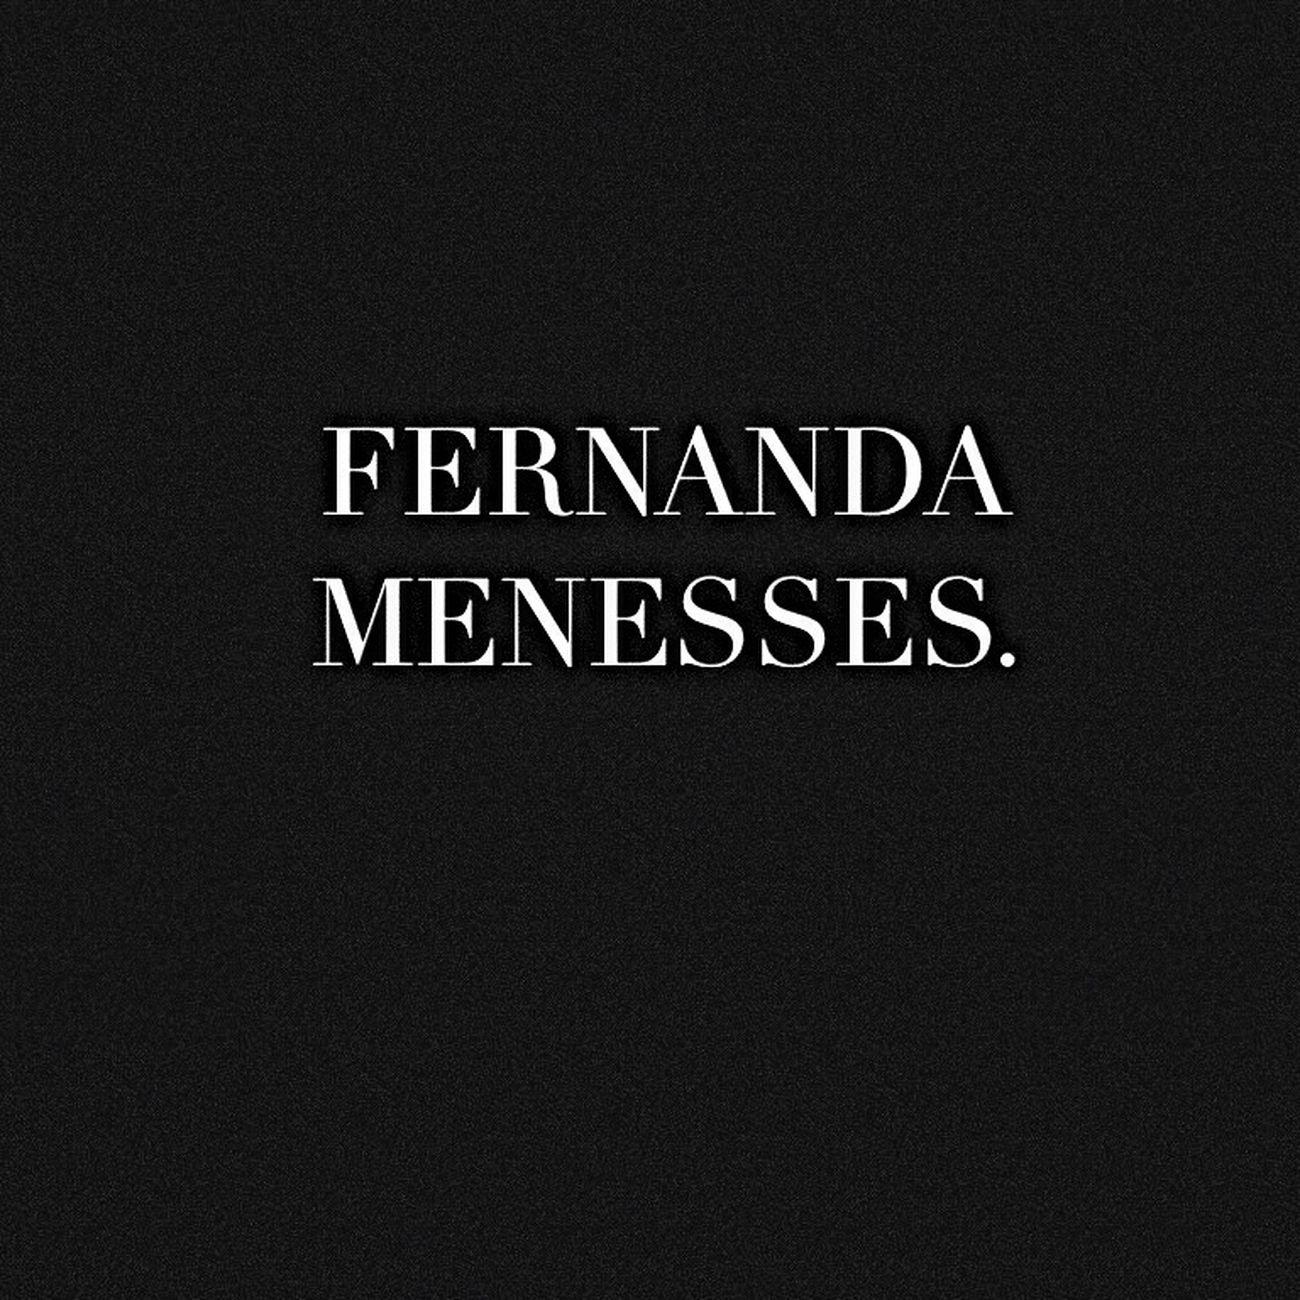 Mi nombre, un gran significado. Name Fotography Descripción My Life Love First Eyeem Photo Fernanda